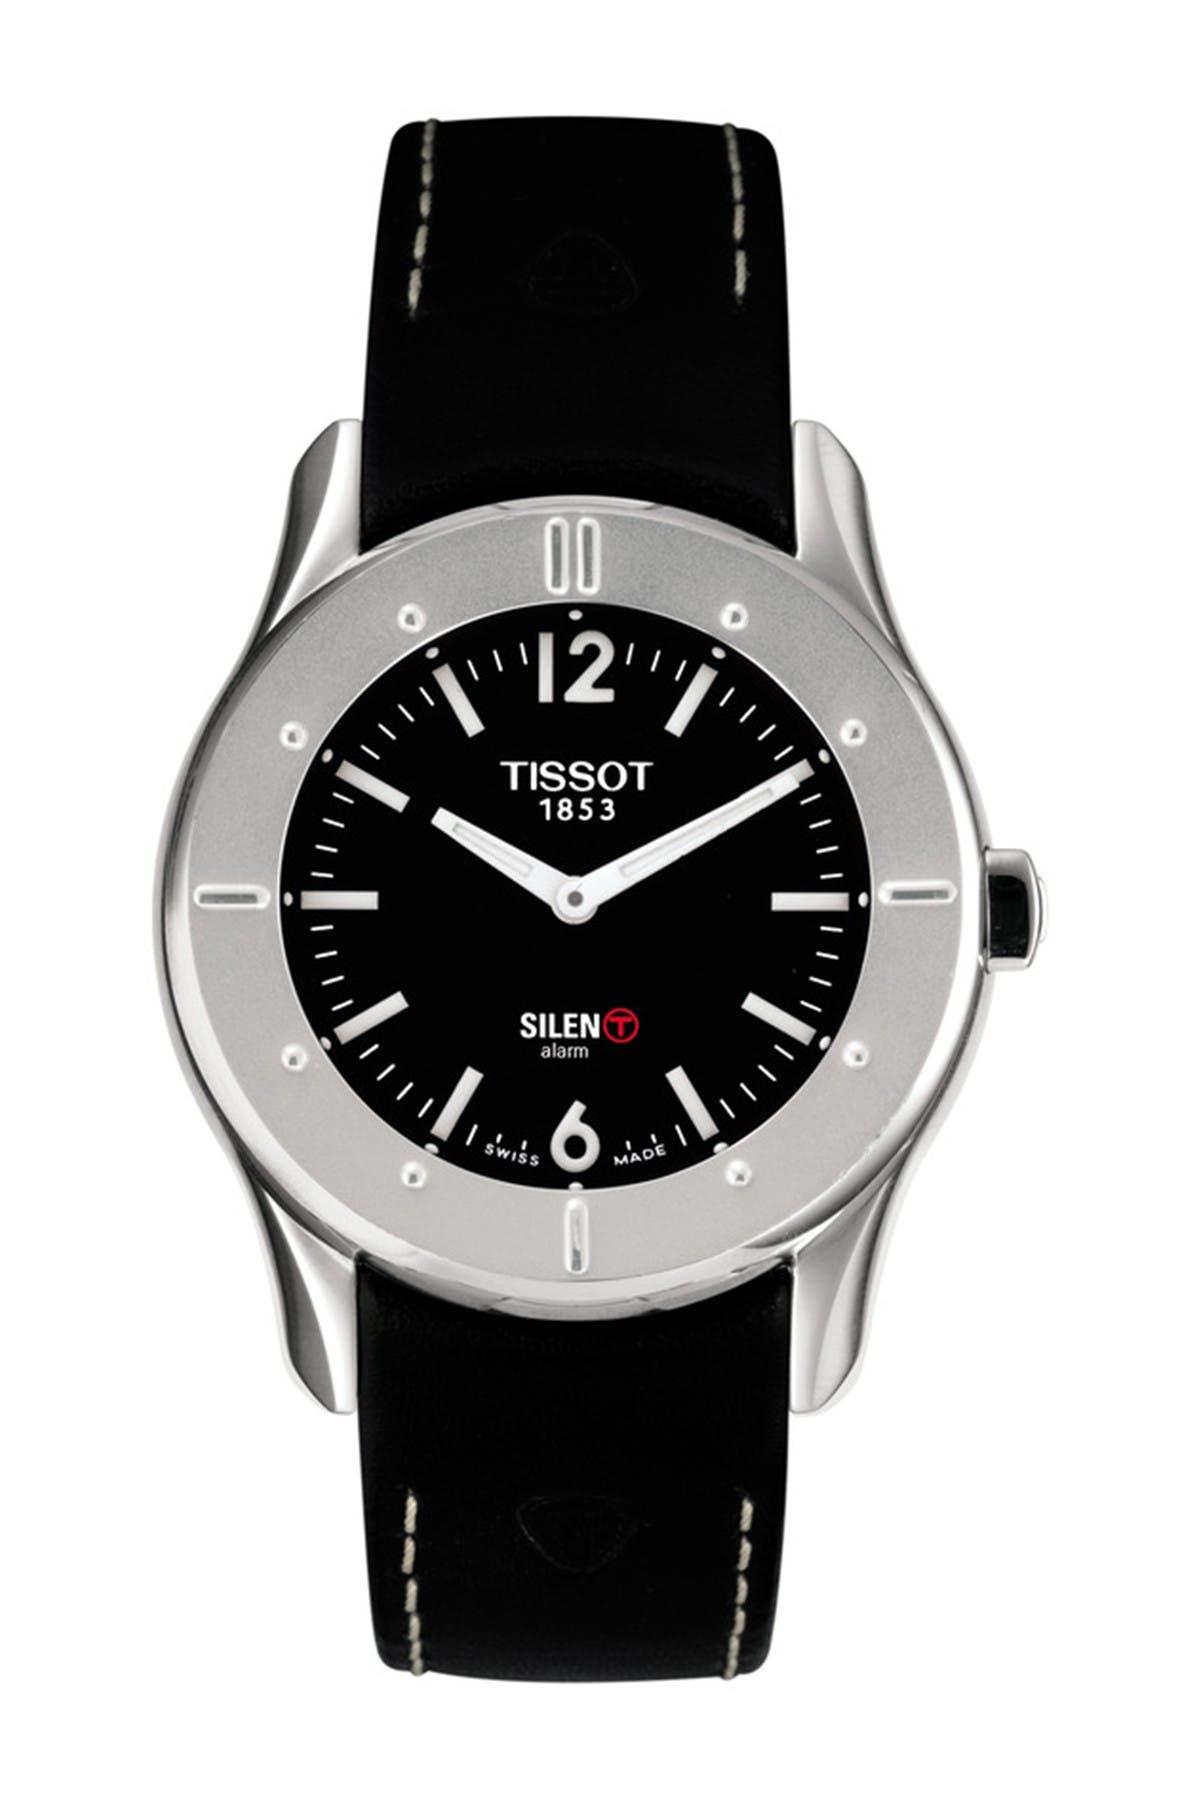 Image of Tissot Men's Touch Silen-T Watch, 39.2mm